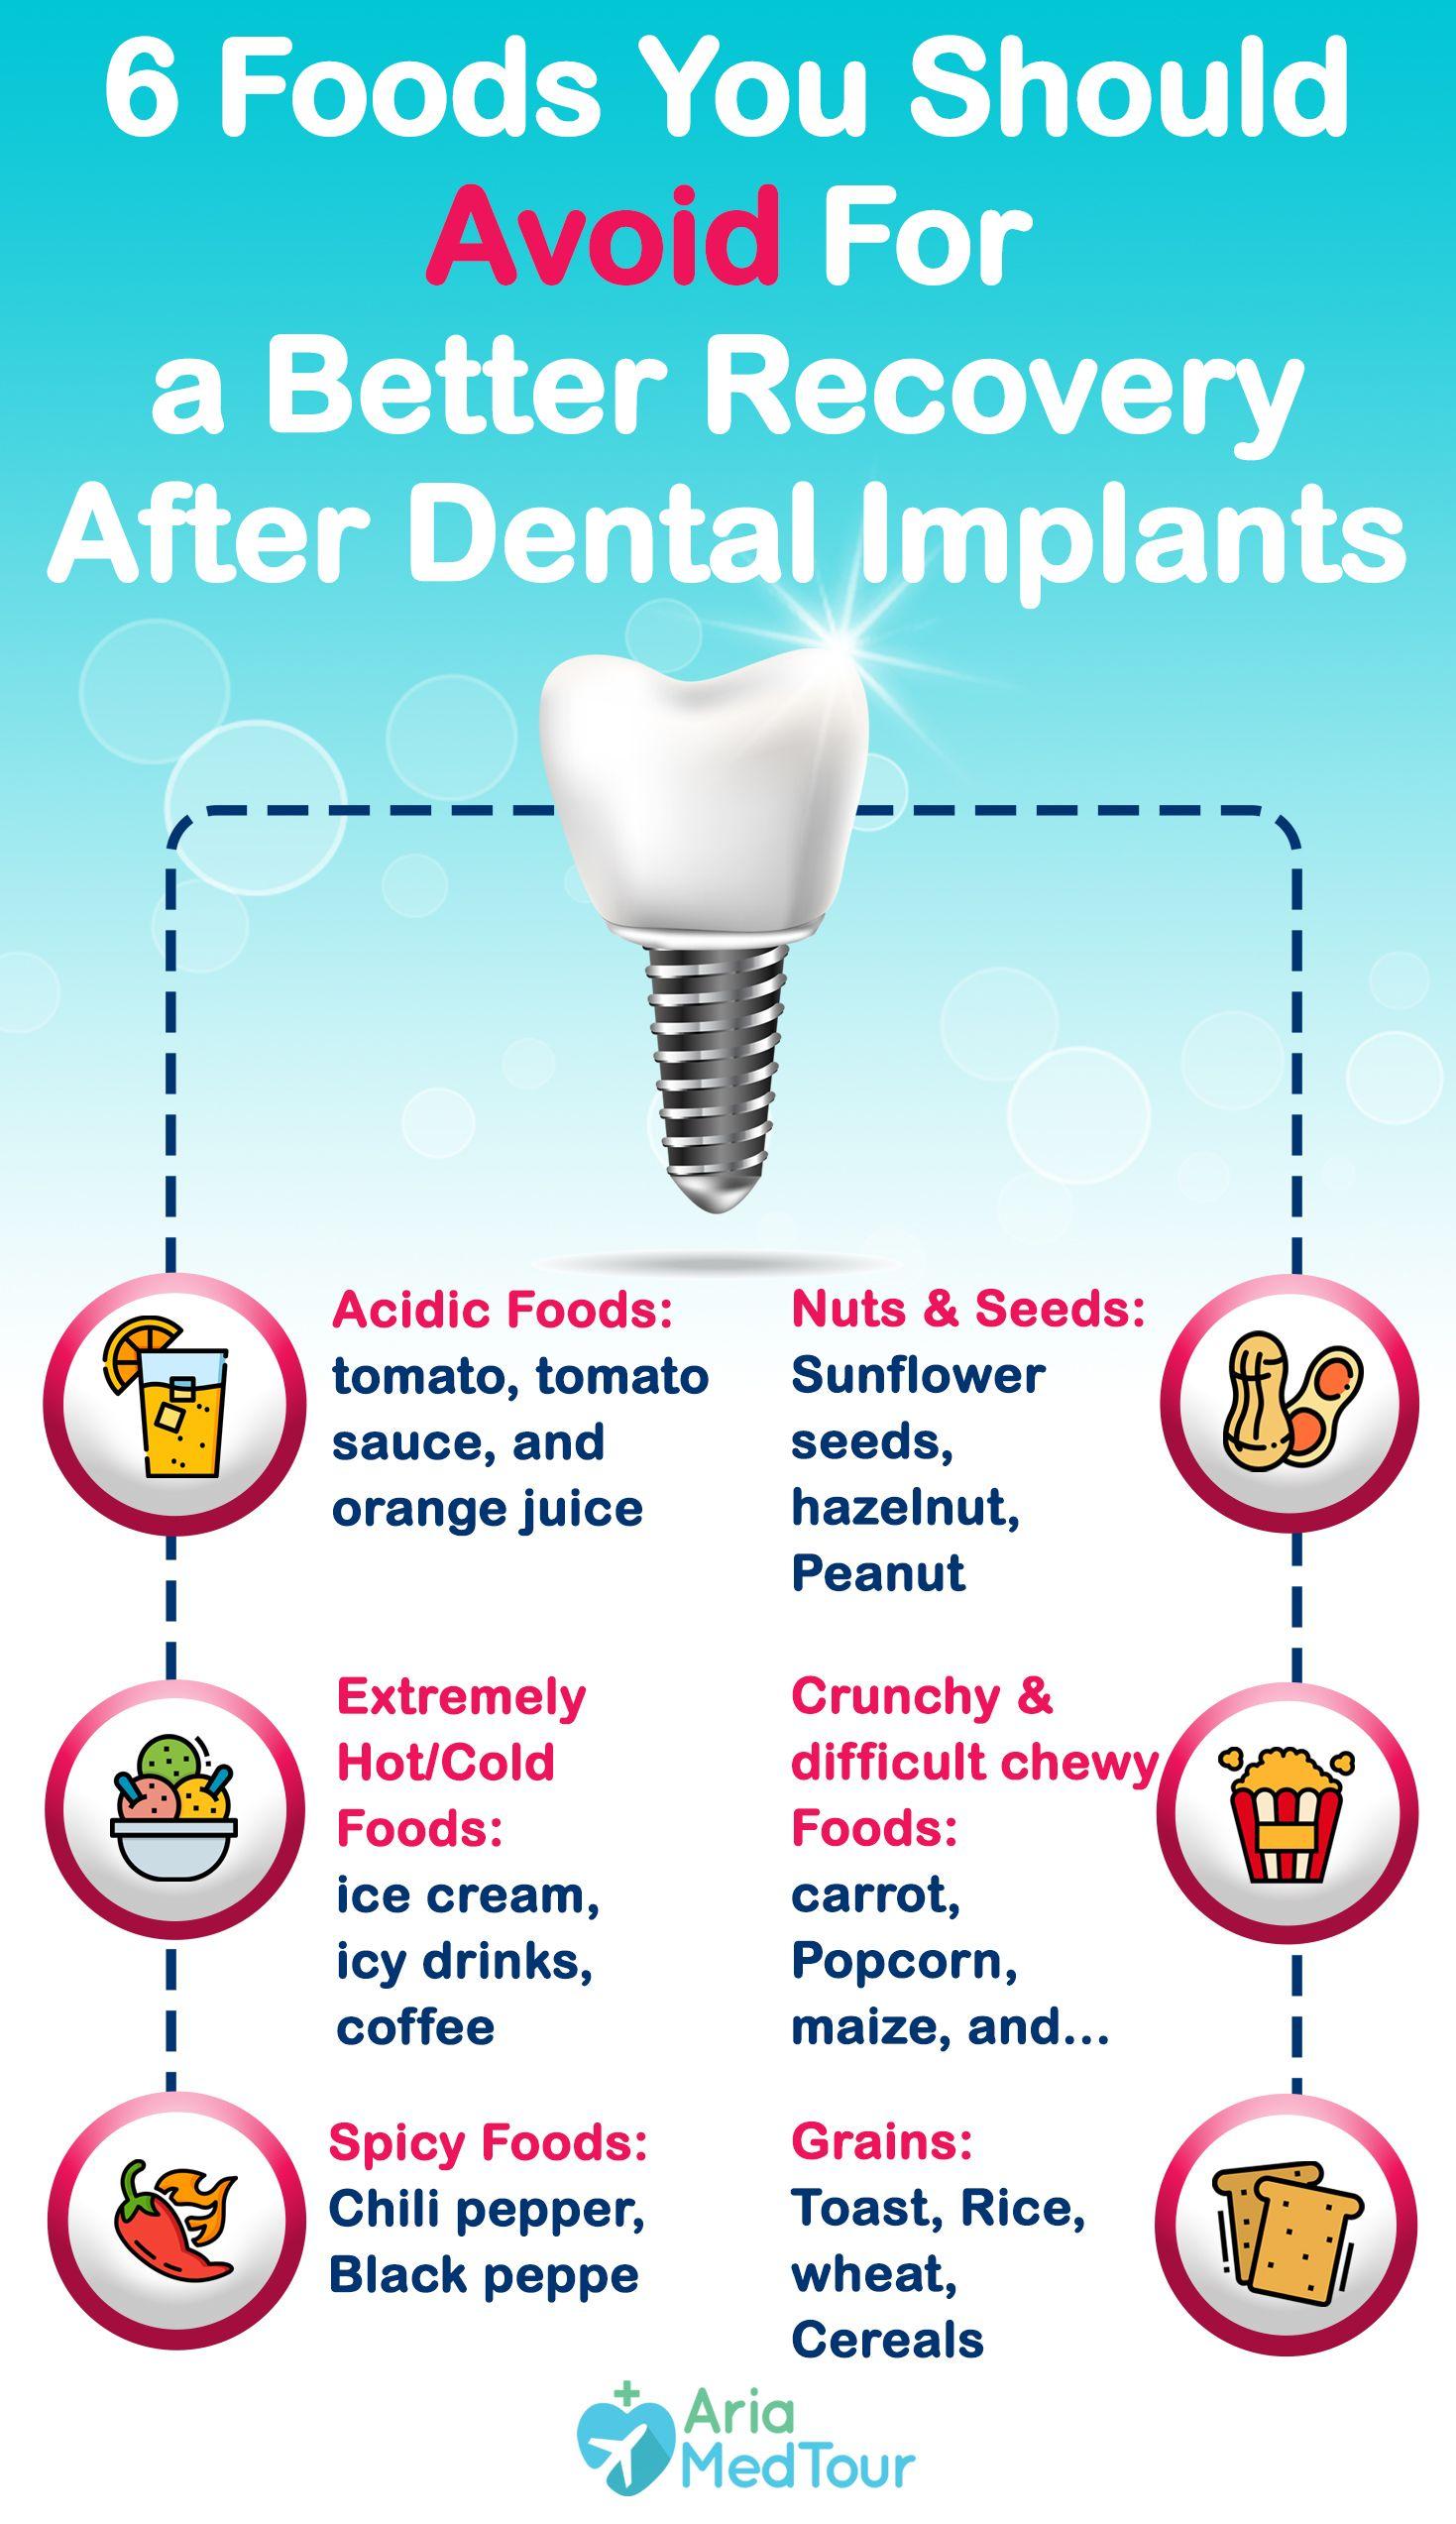 28 Easy Vegan Wisdom Teeth Removal Food Recipes Tips For Healing Wisdom Teeth Removal Food Wisdom Teeth Recovery Food Wisdom Teeth Food